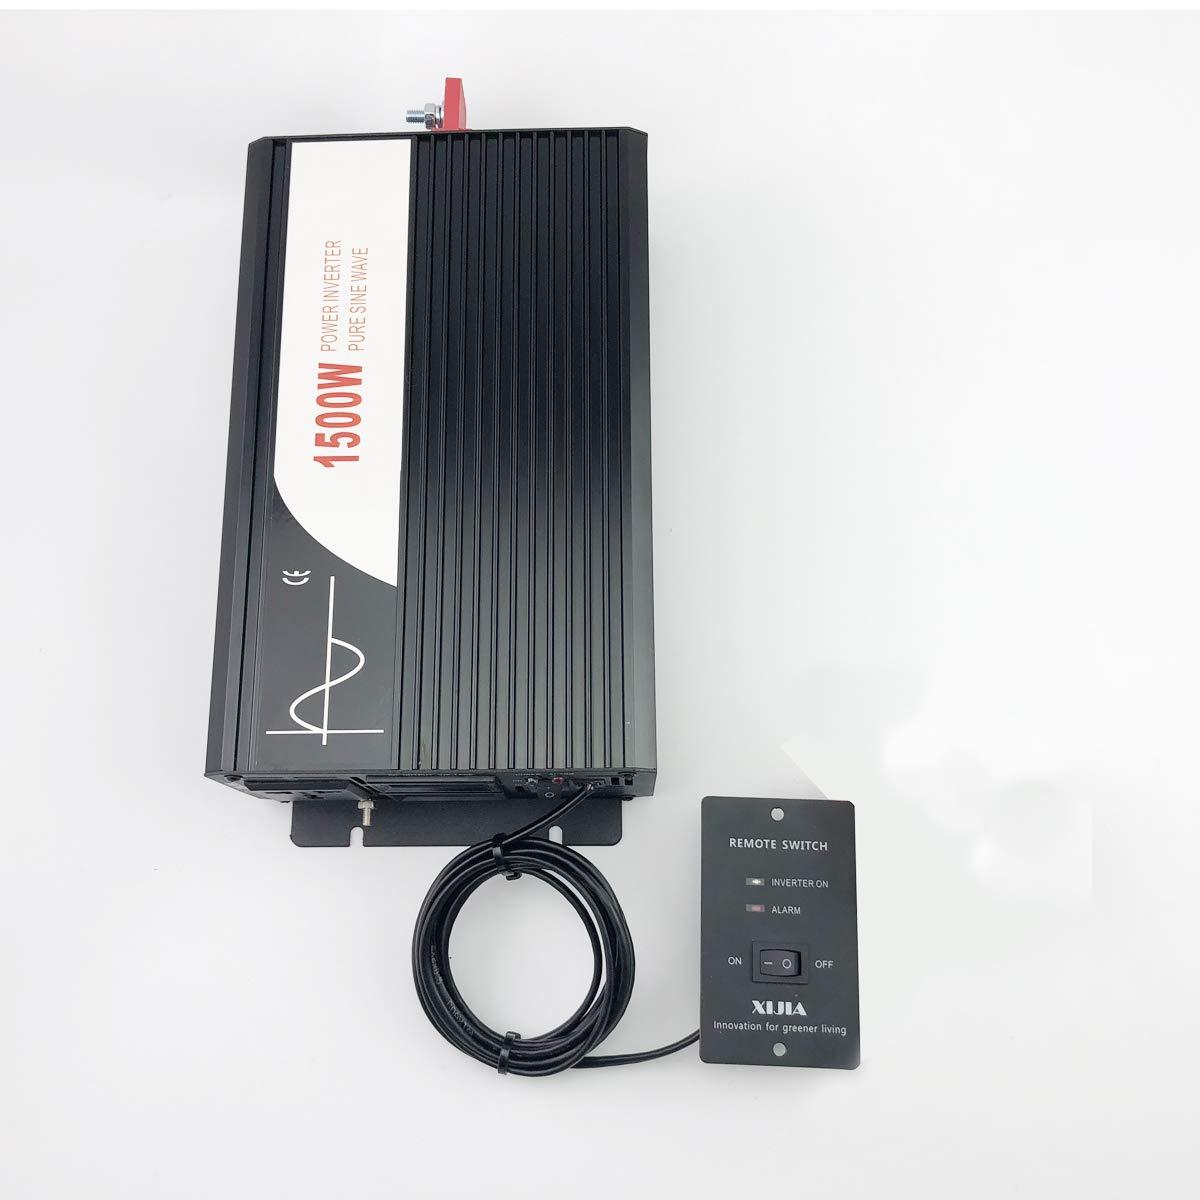 Xijia 1500W (Peak 3000W) Pure Sine Wave Power Inverter DC 24V 48V to AC 120V 60HZ Solar Converter for Home Use car (DC 24V to AC 120V)